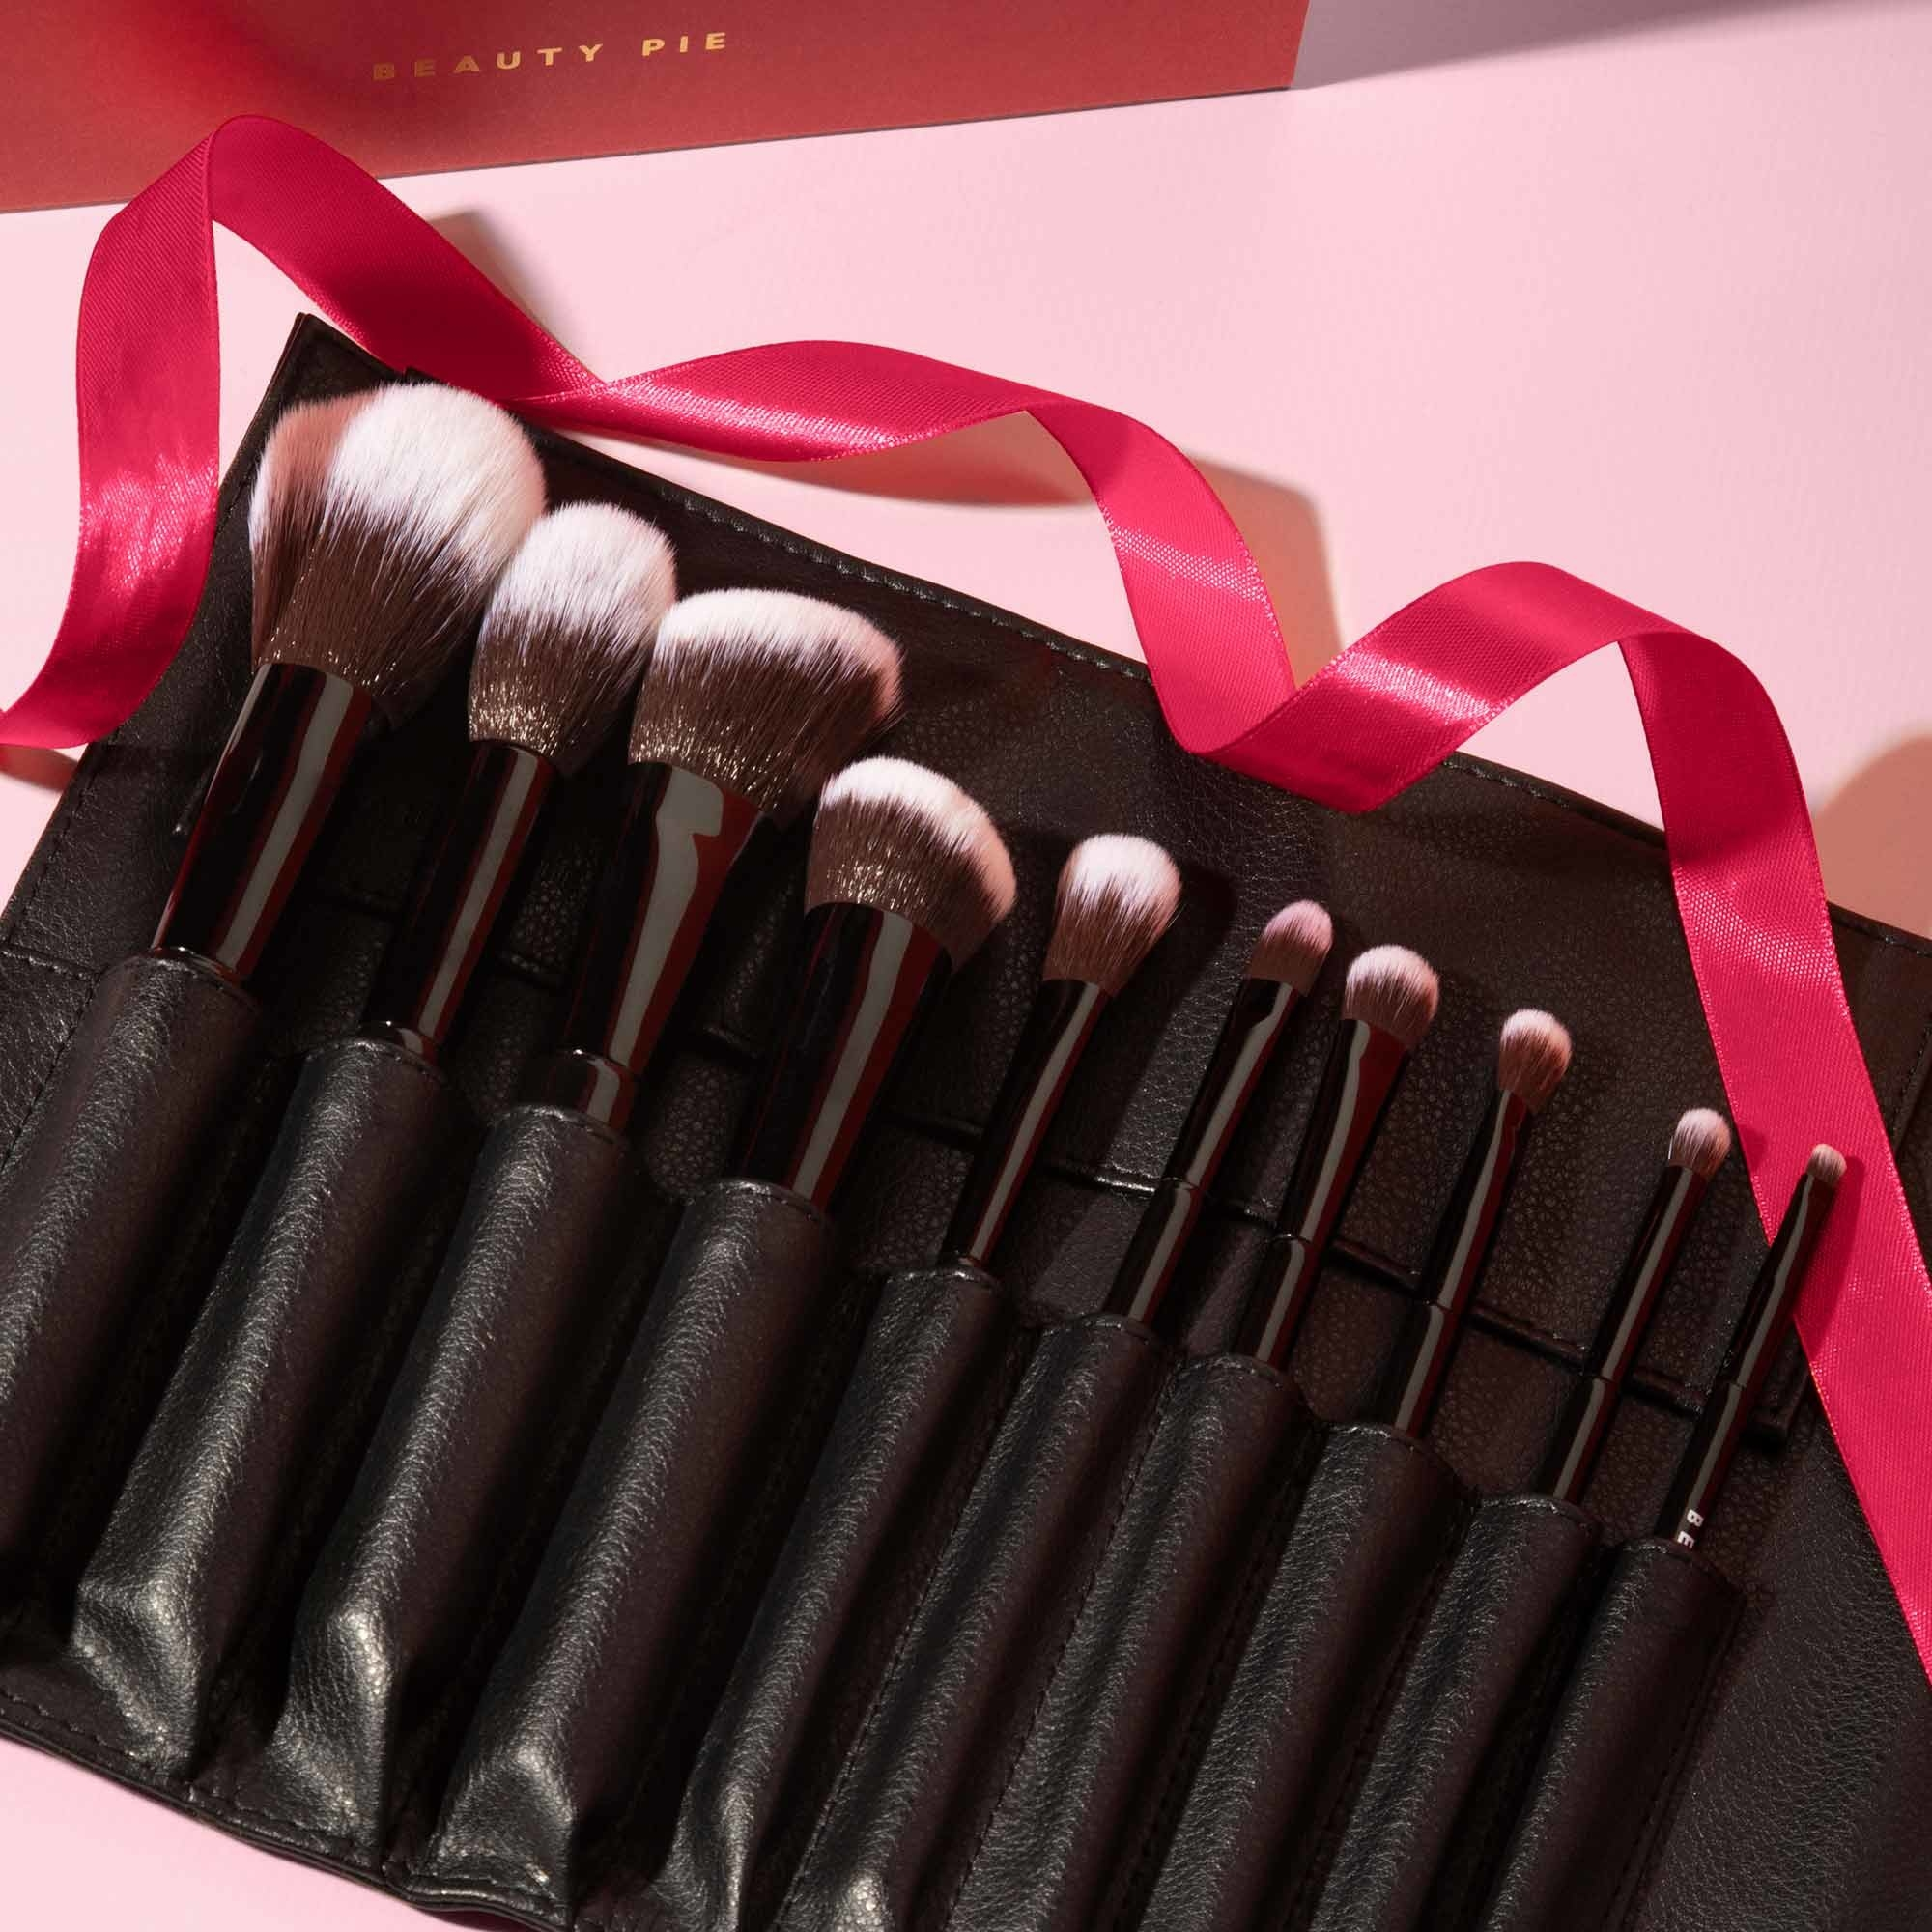 10 piece makeup brush kit on table